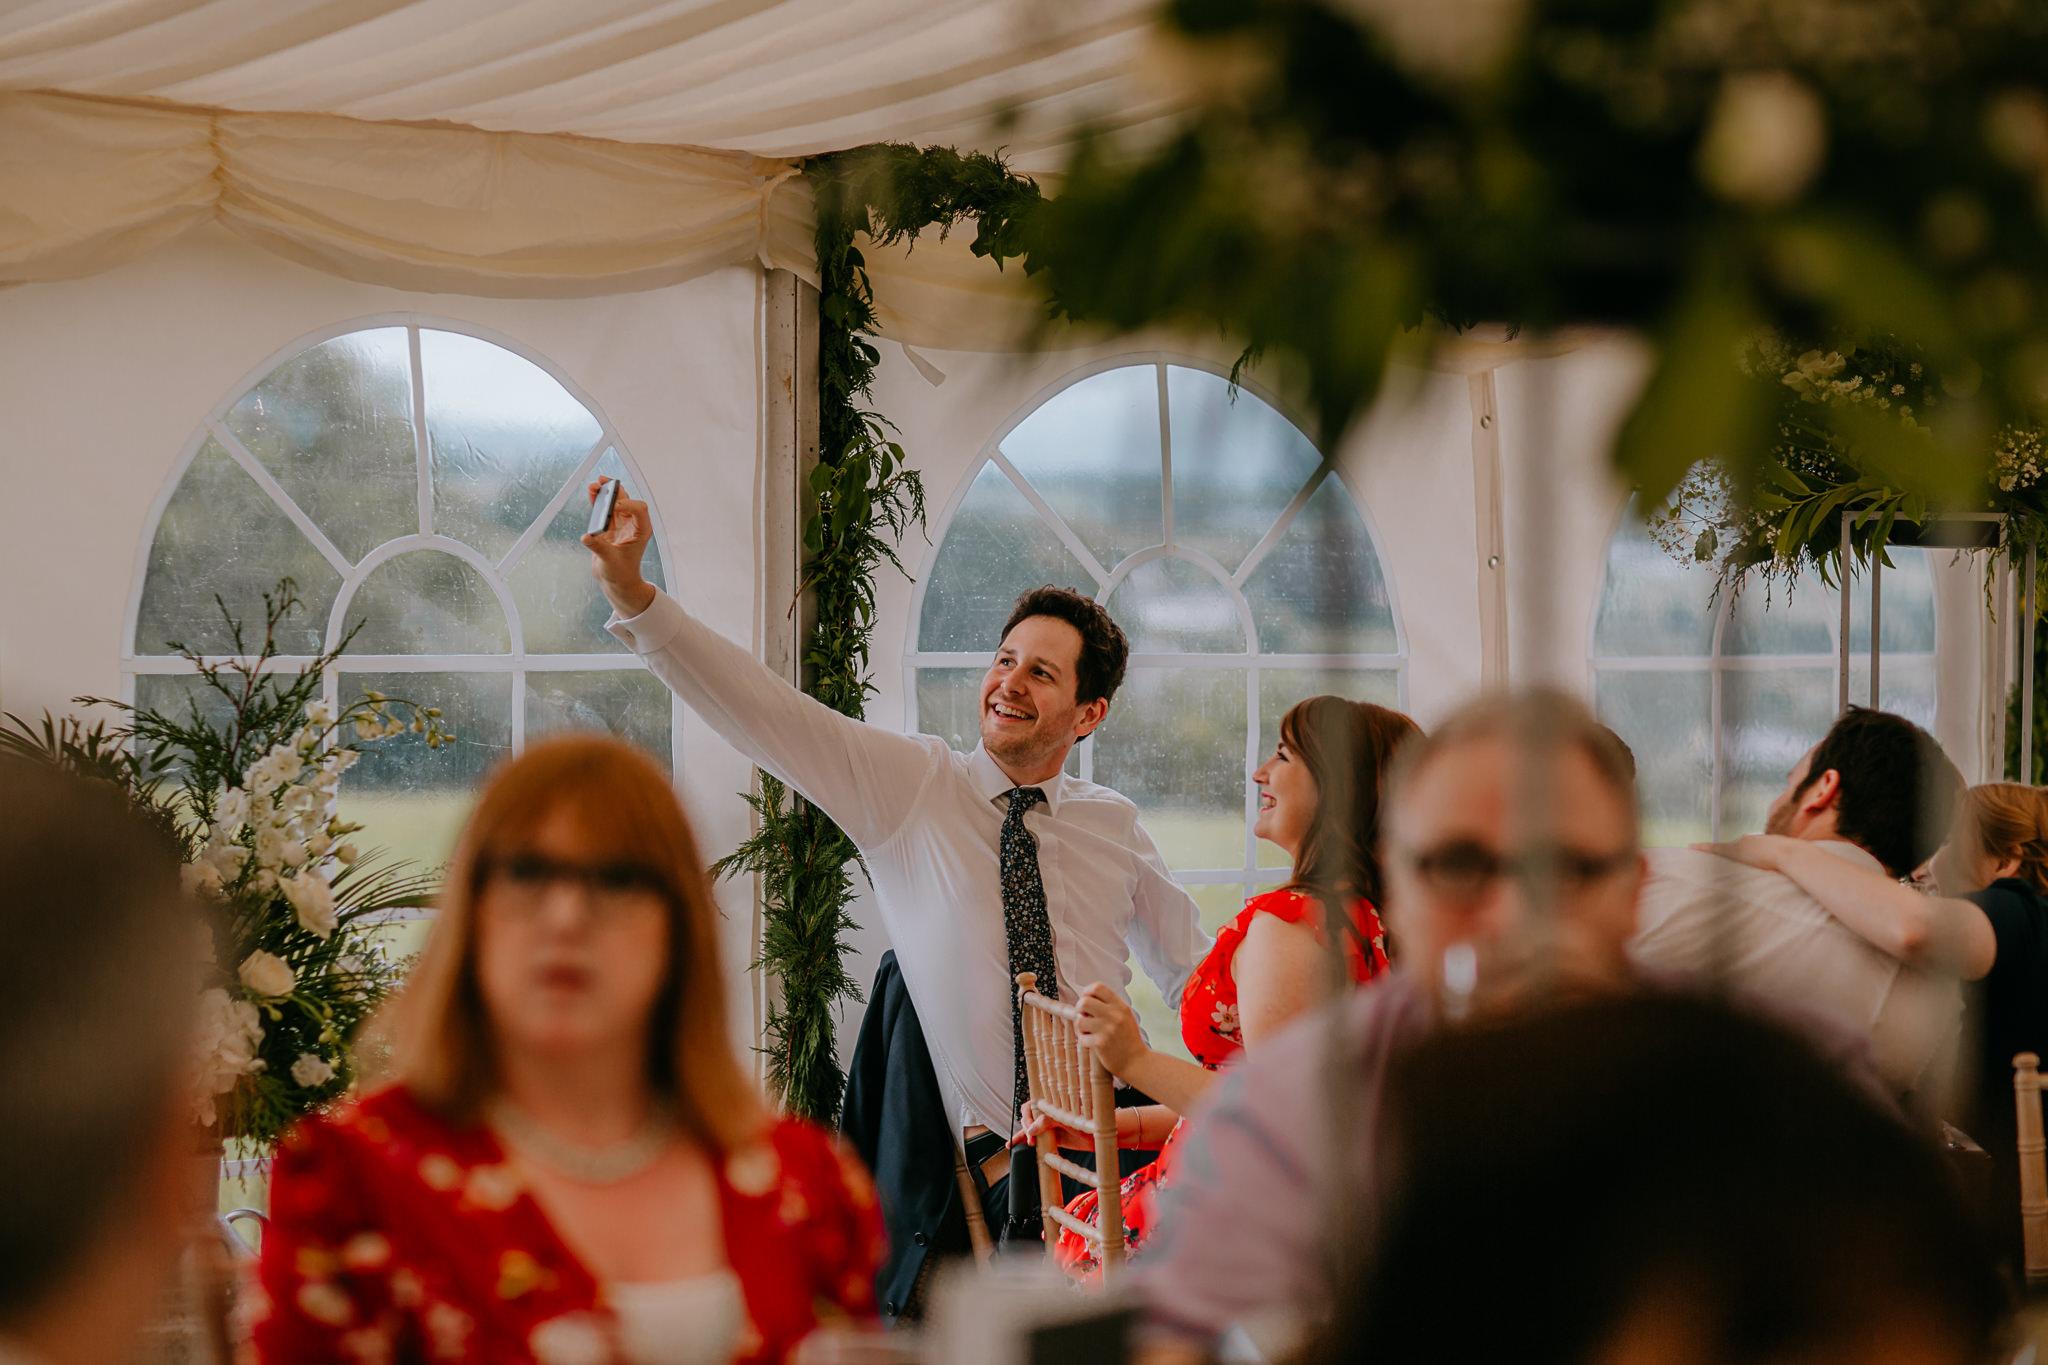 guest taking selfie at wedding recepetion